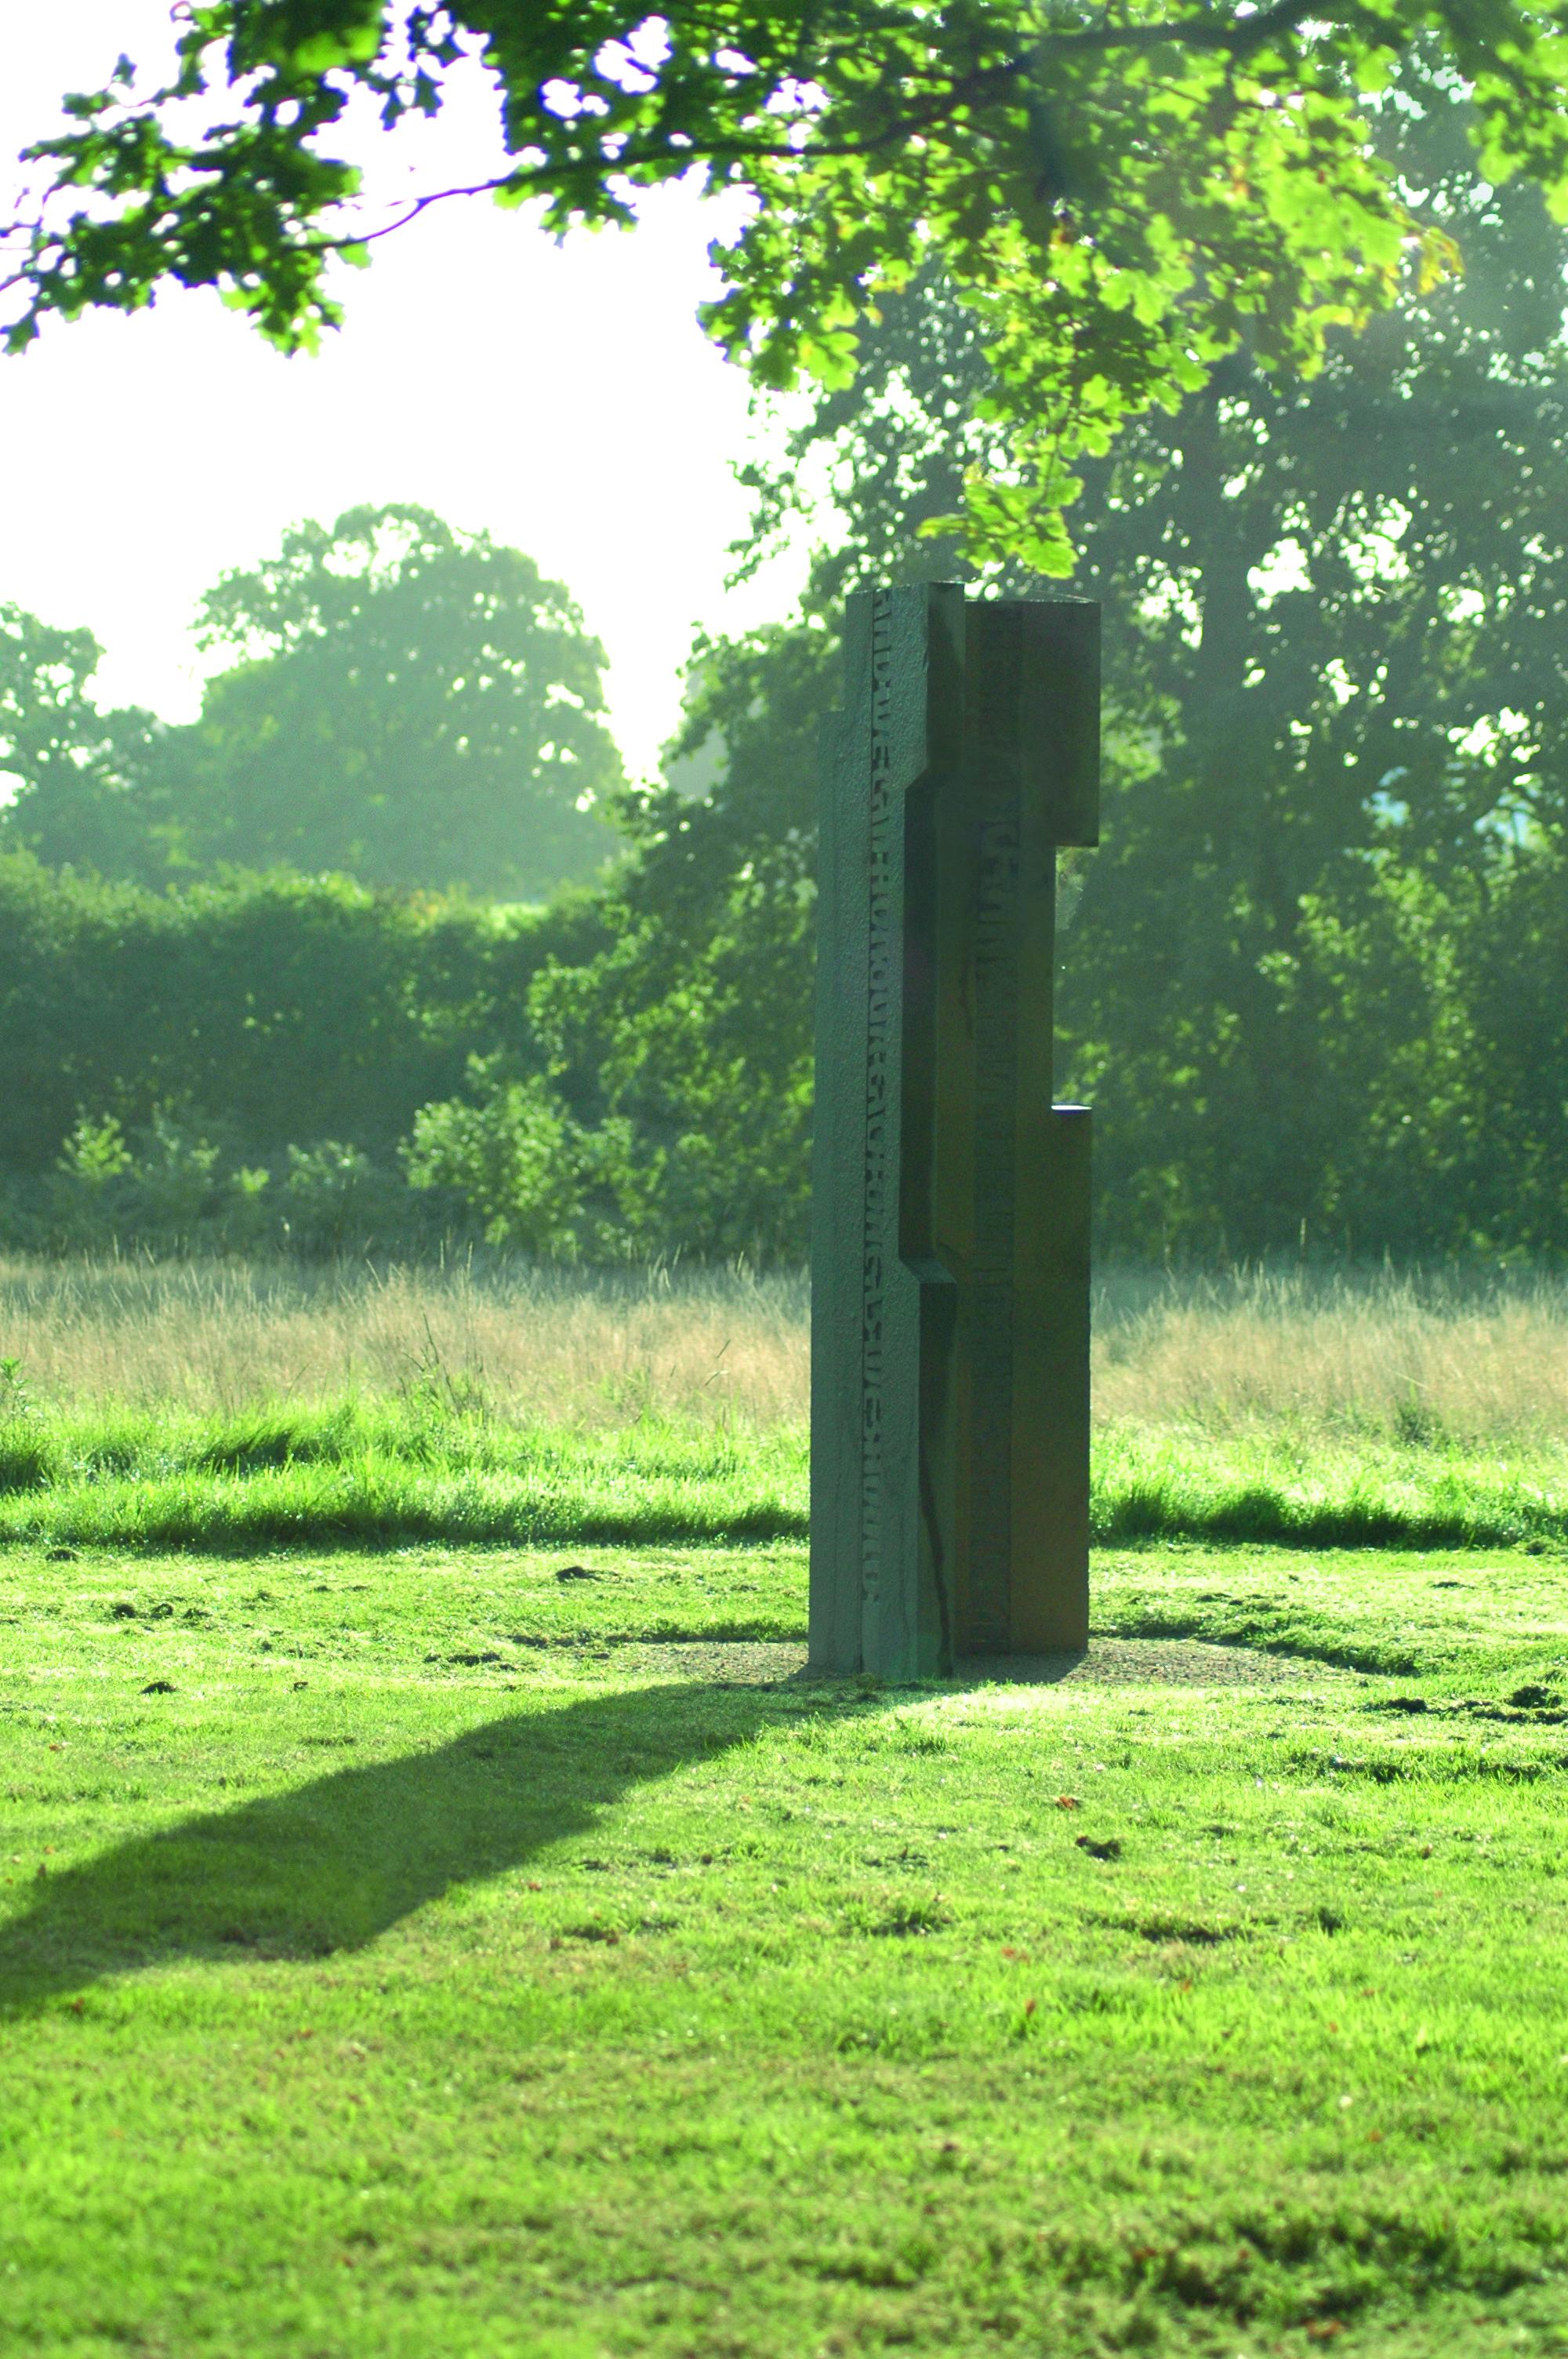 Victoria Cross Grove memorial sculpture